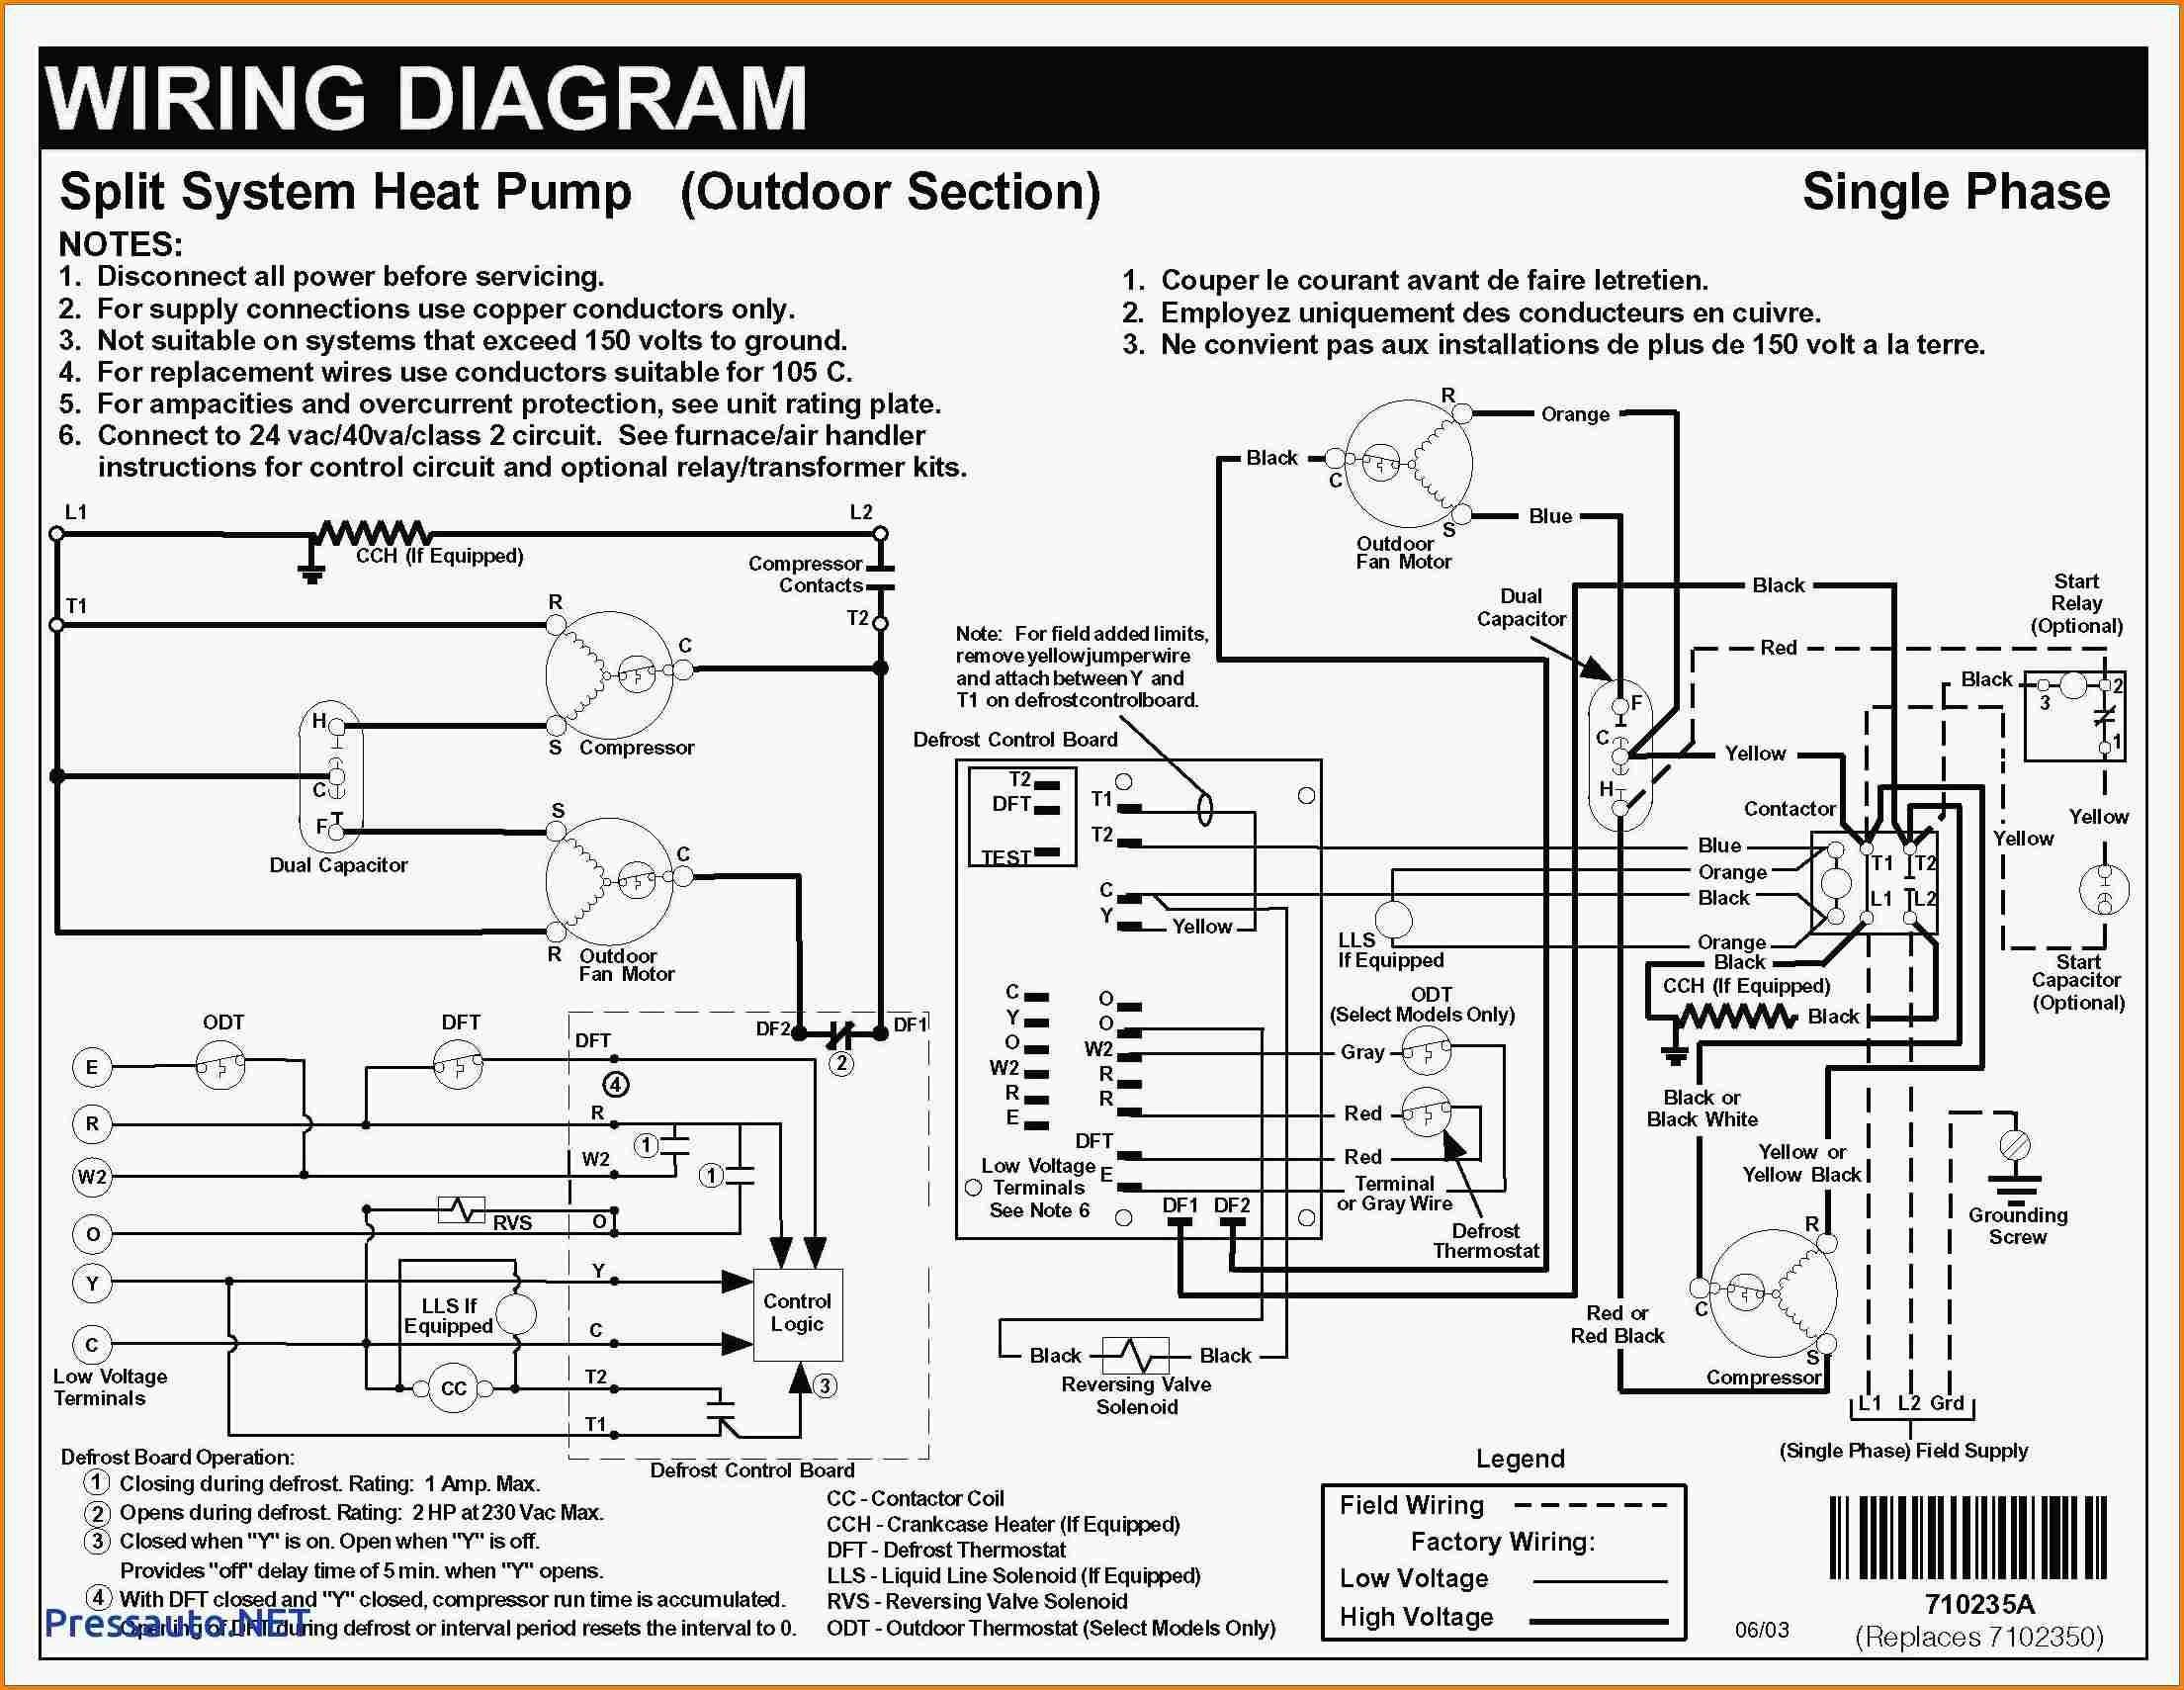 Basic Electric Furnace Wiring Diagram Free Download Goodman Heat Strip Addict Nordyne Nortron Rheem Thermostat 5